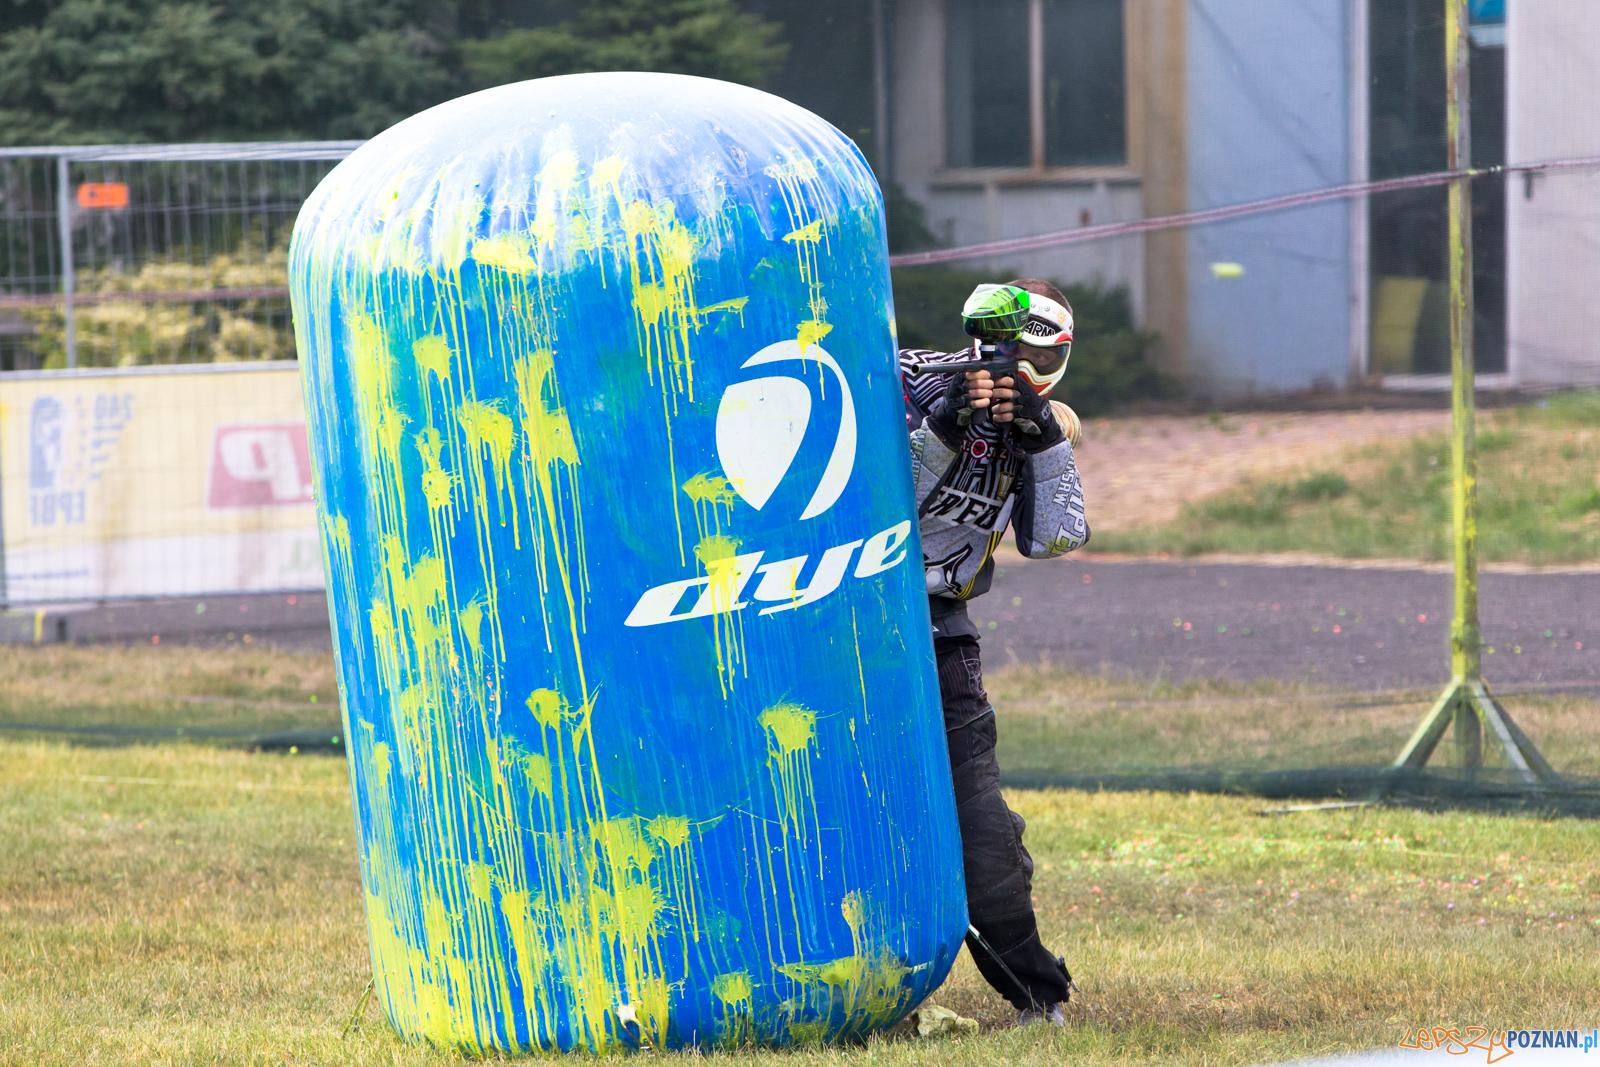 Poznan Paintball Weekend  Foto: lepszyPOZNAN.pl/Piotr Rychter